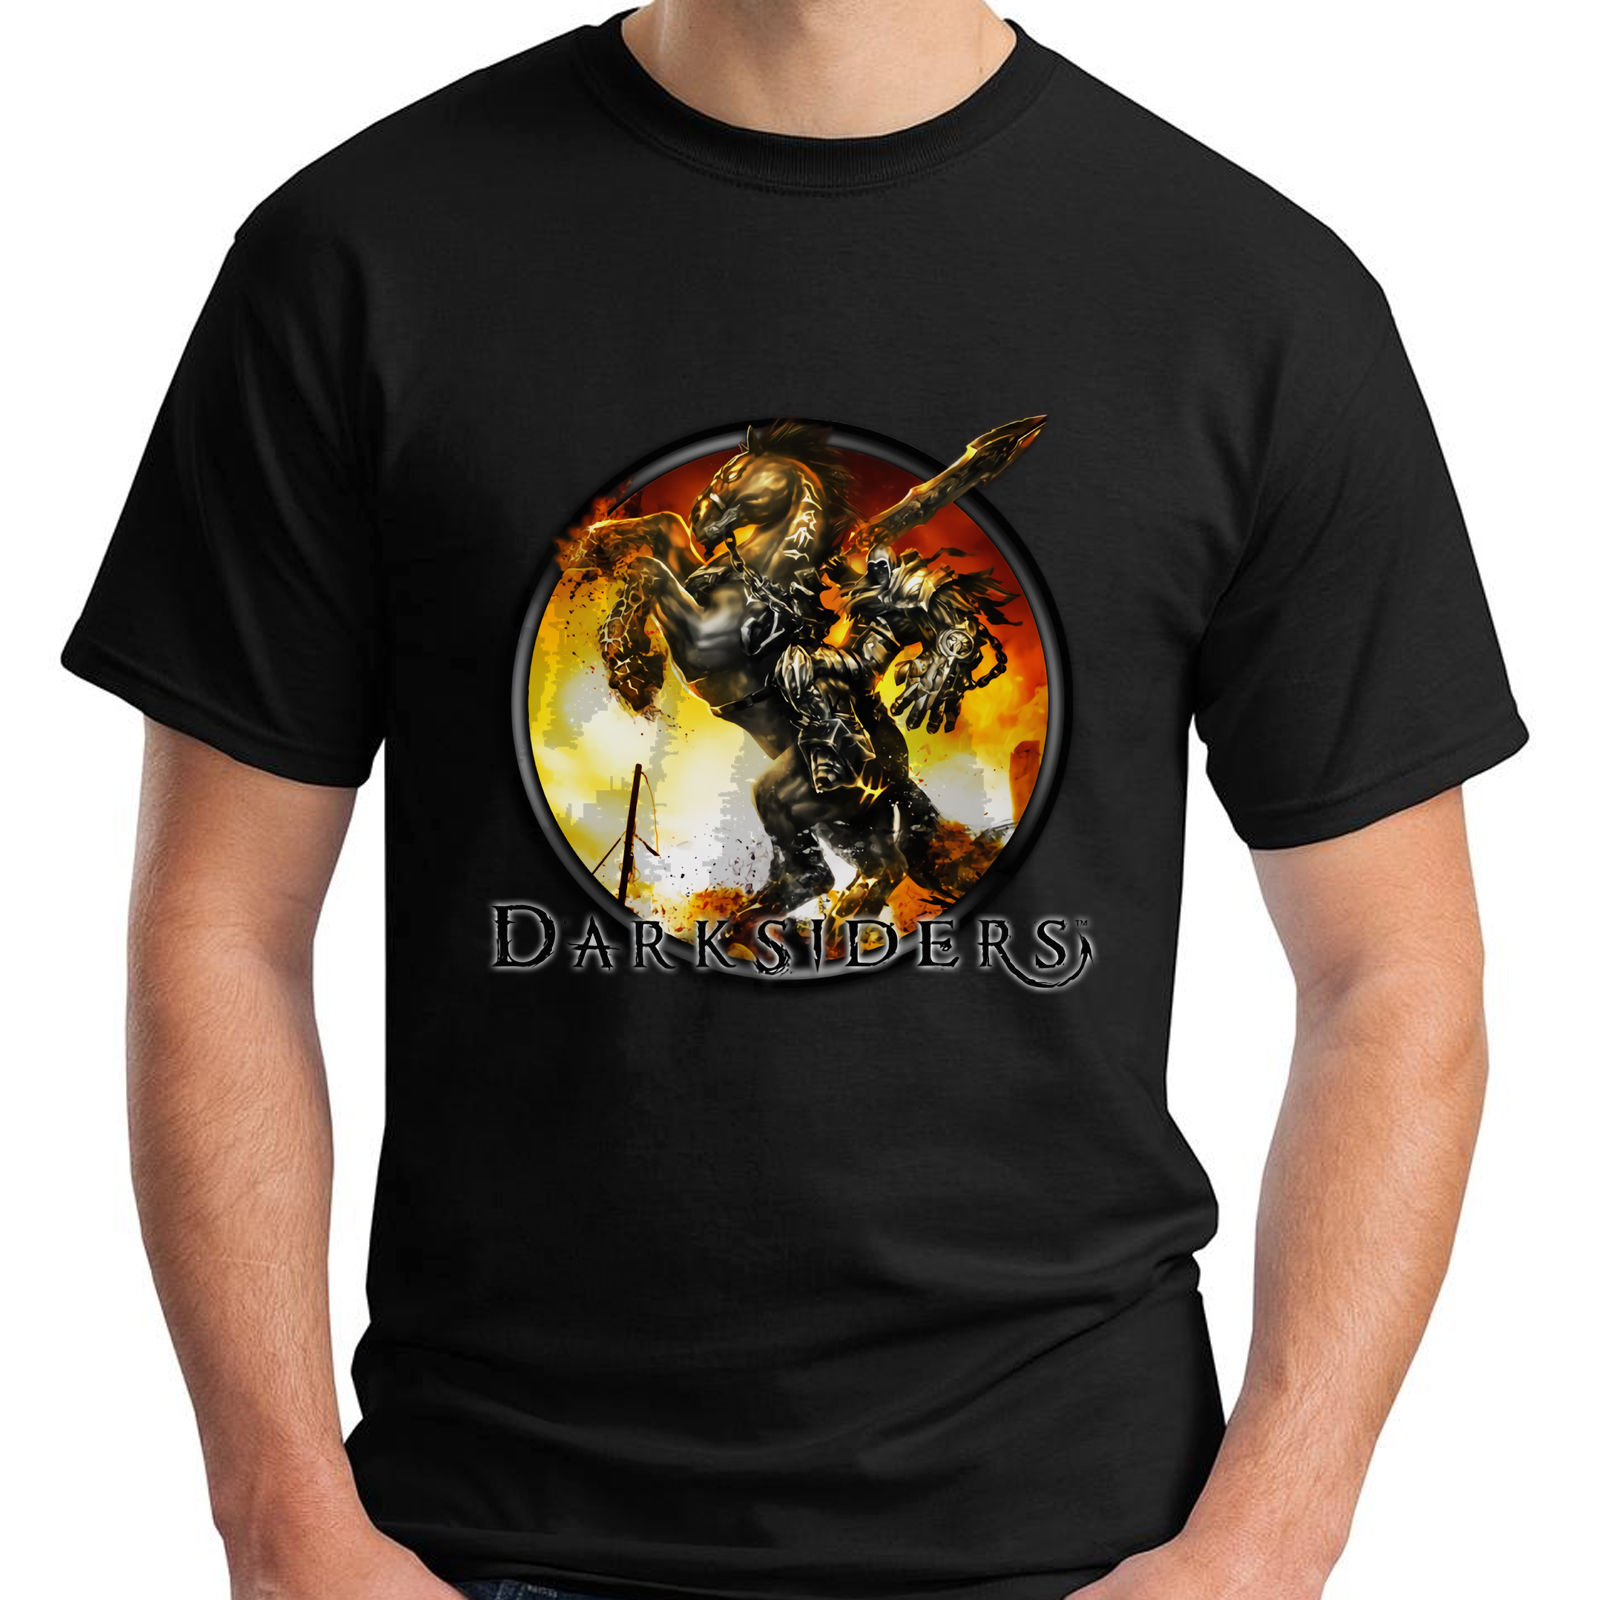 Darksiders Death War Four Horseman Game Darksouls Skyrim Lord Of Shadow T-Shirt